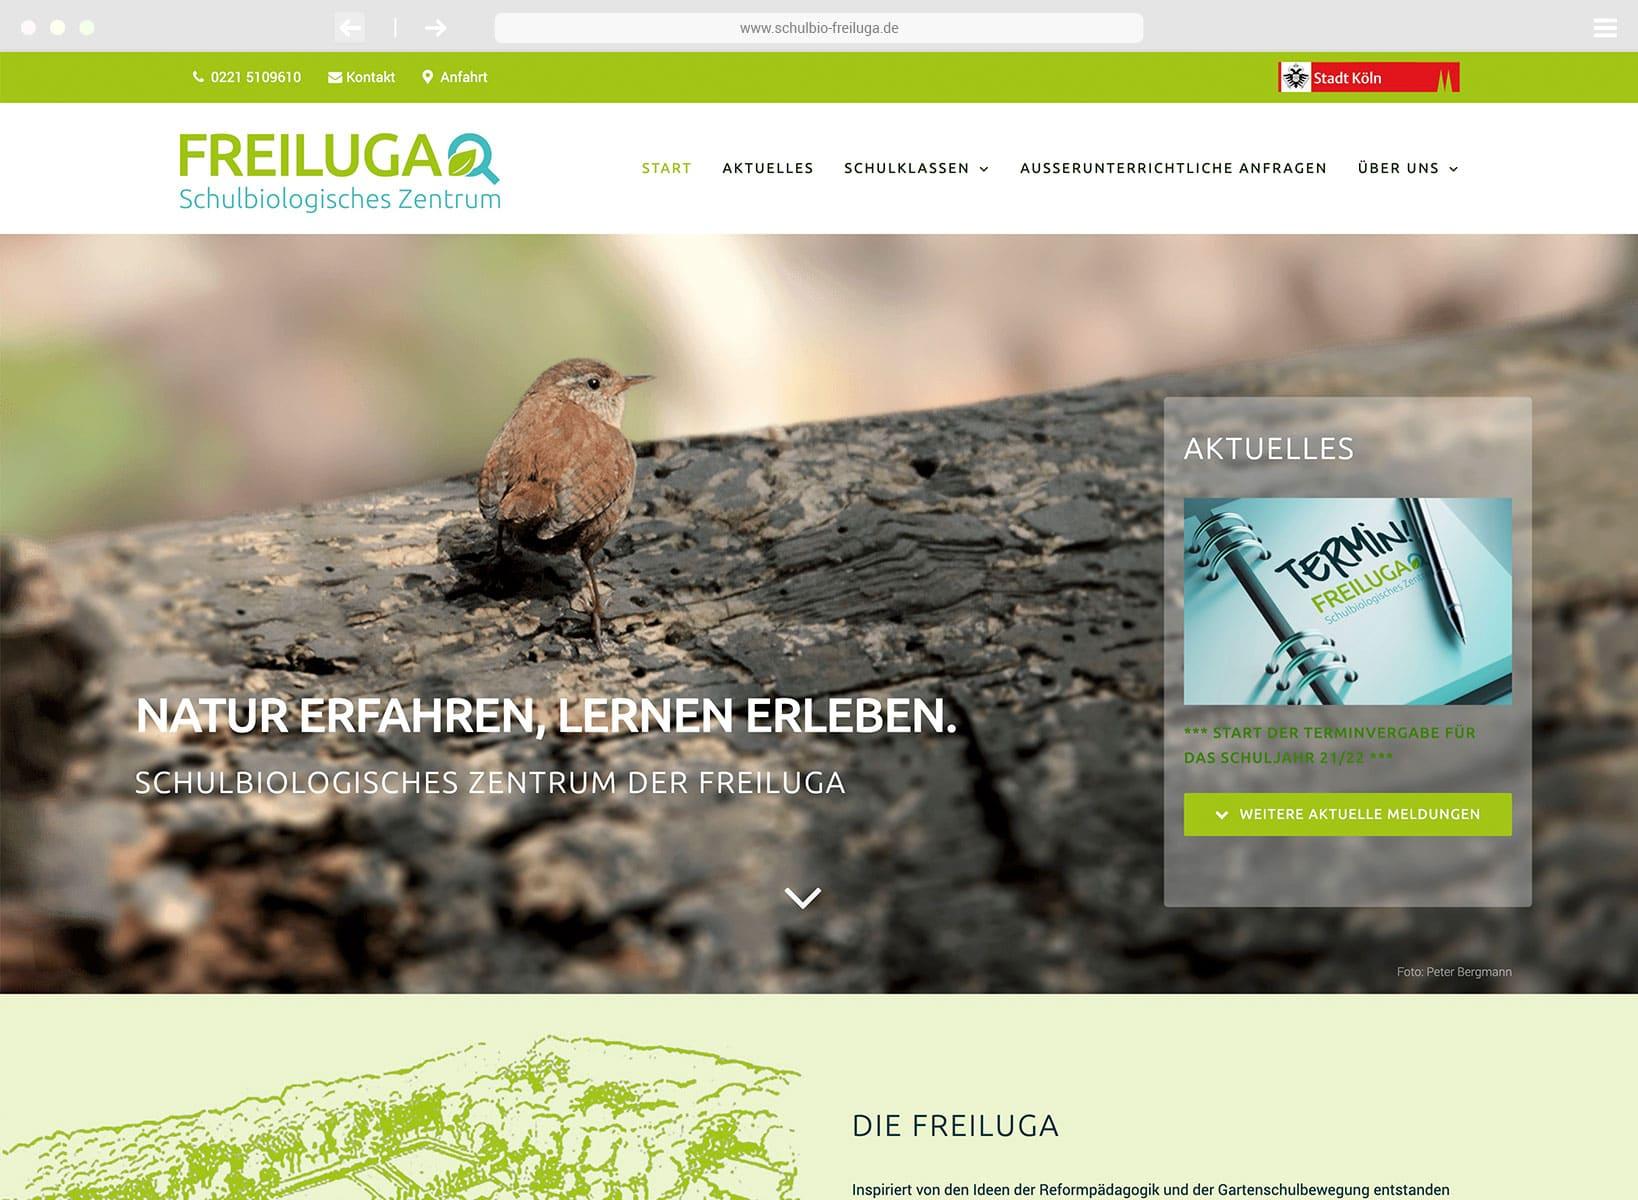 www.schulbio-freiluga.de